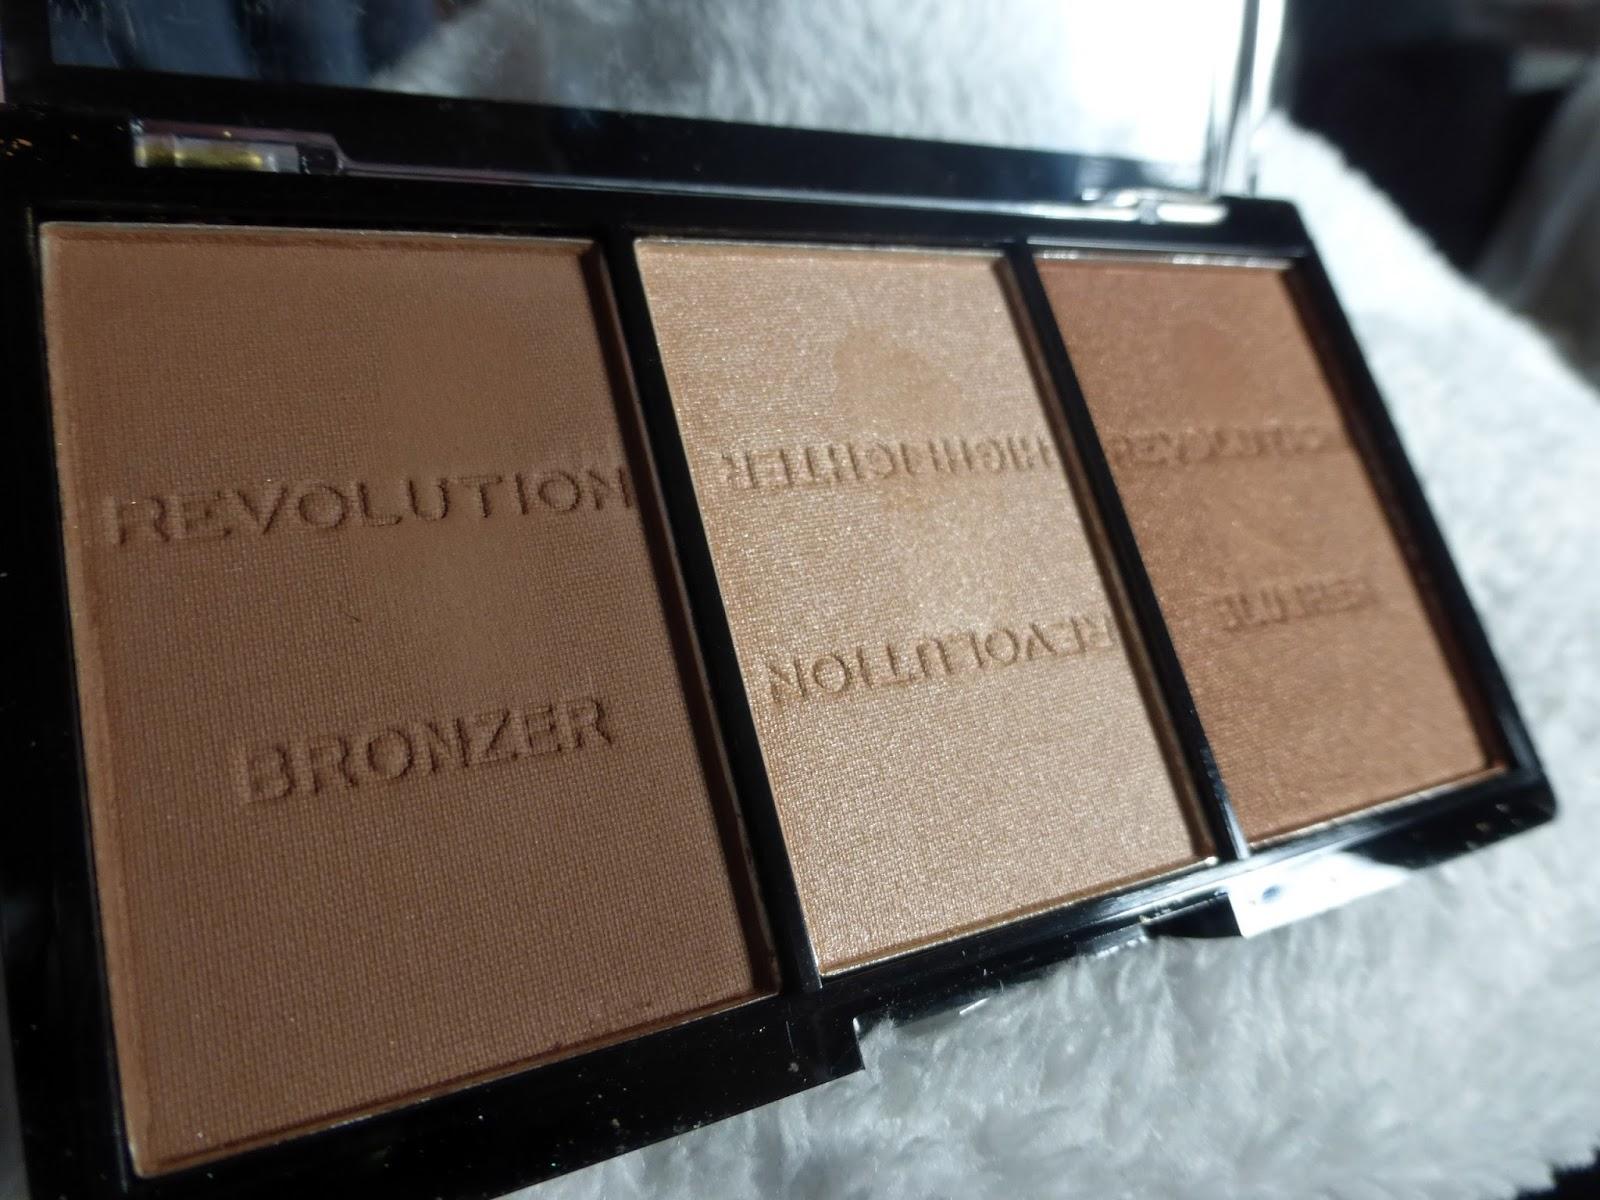 Review Makeuprevolution Ultra Sculpt Contour Kit Light Medium C04 Brightening Fair C01